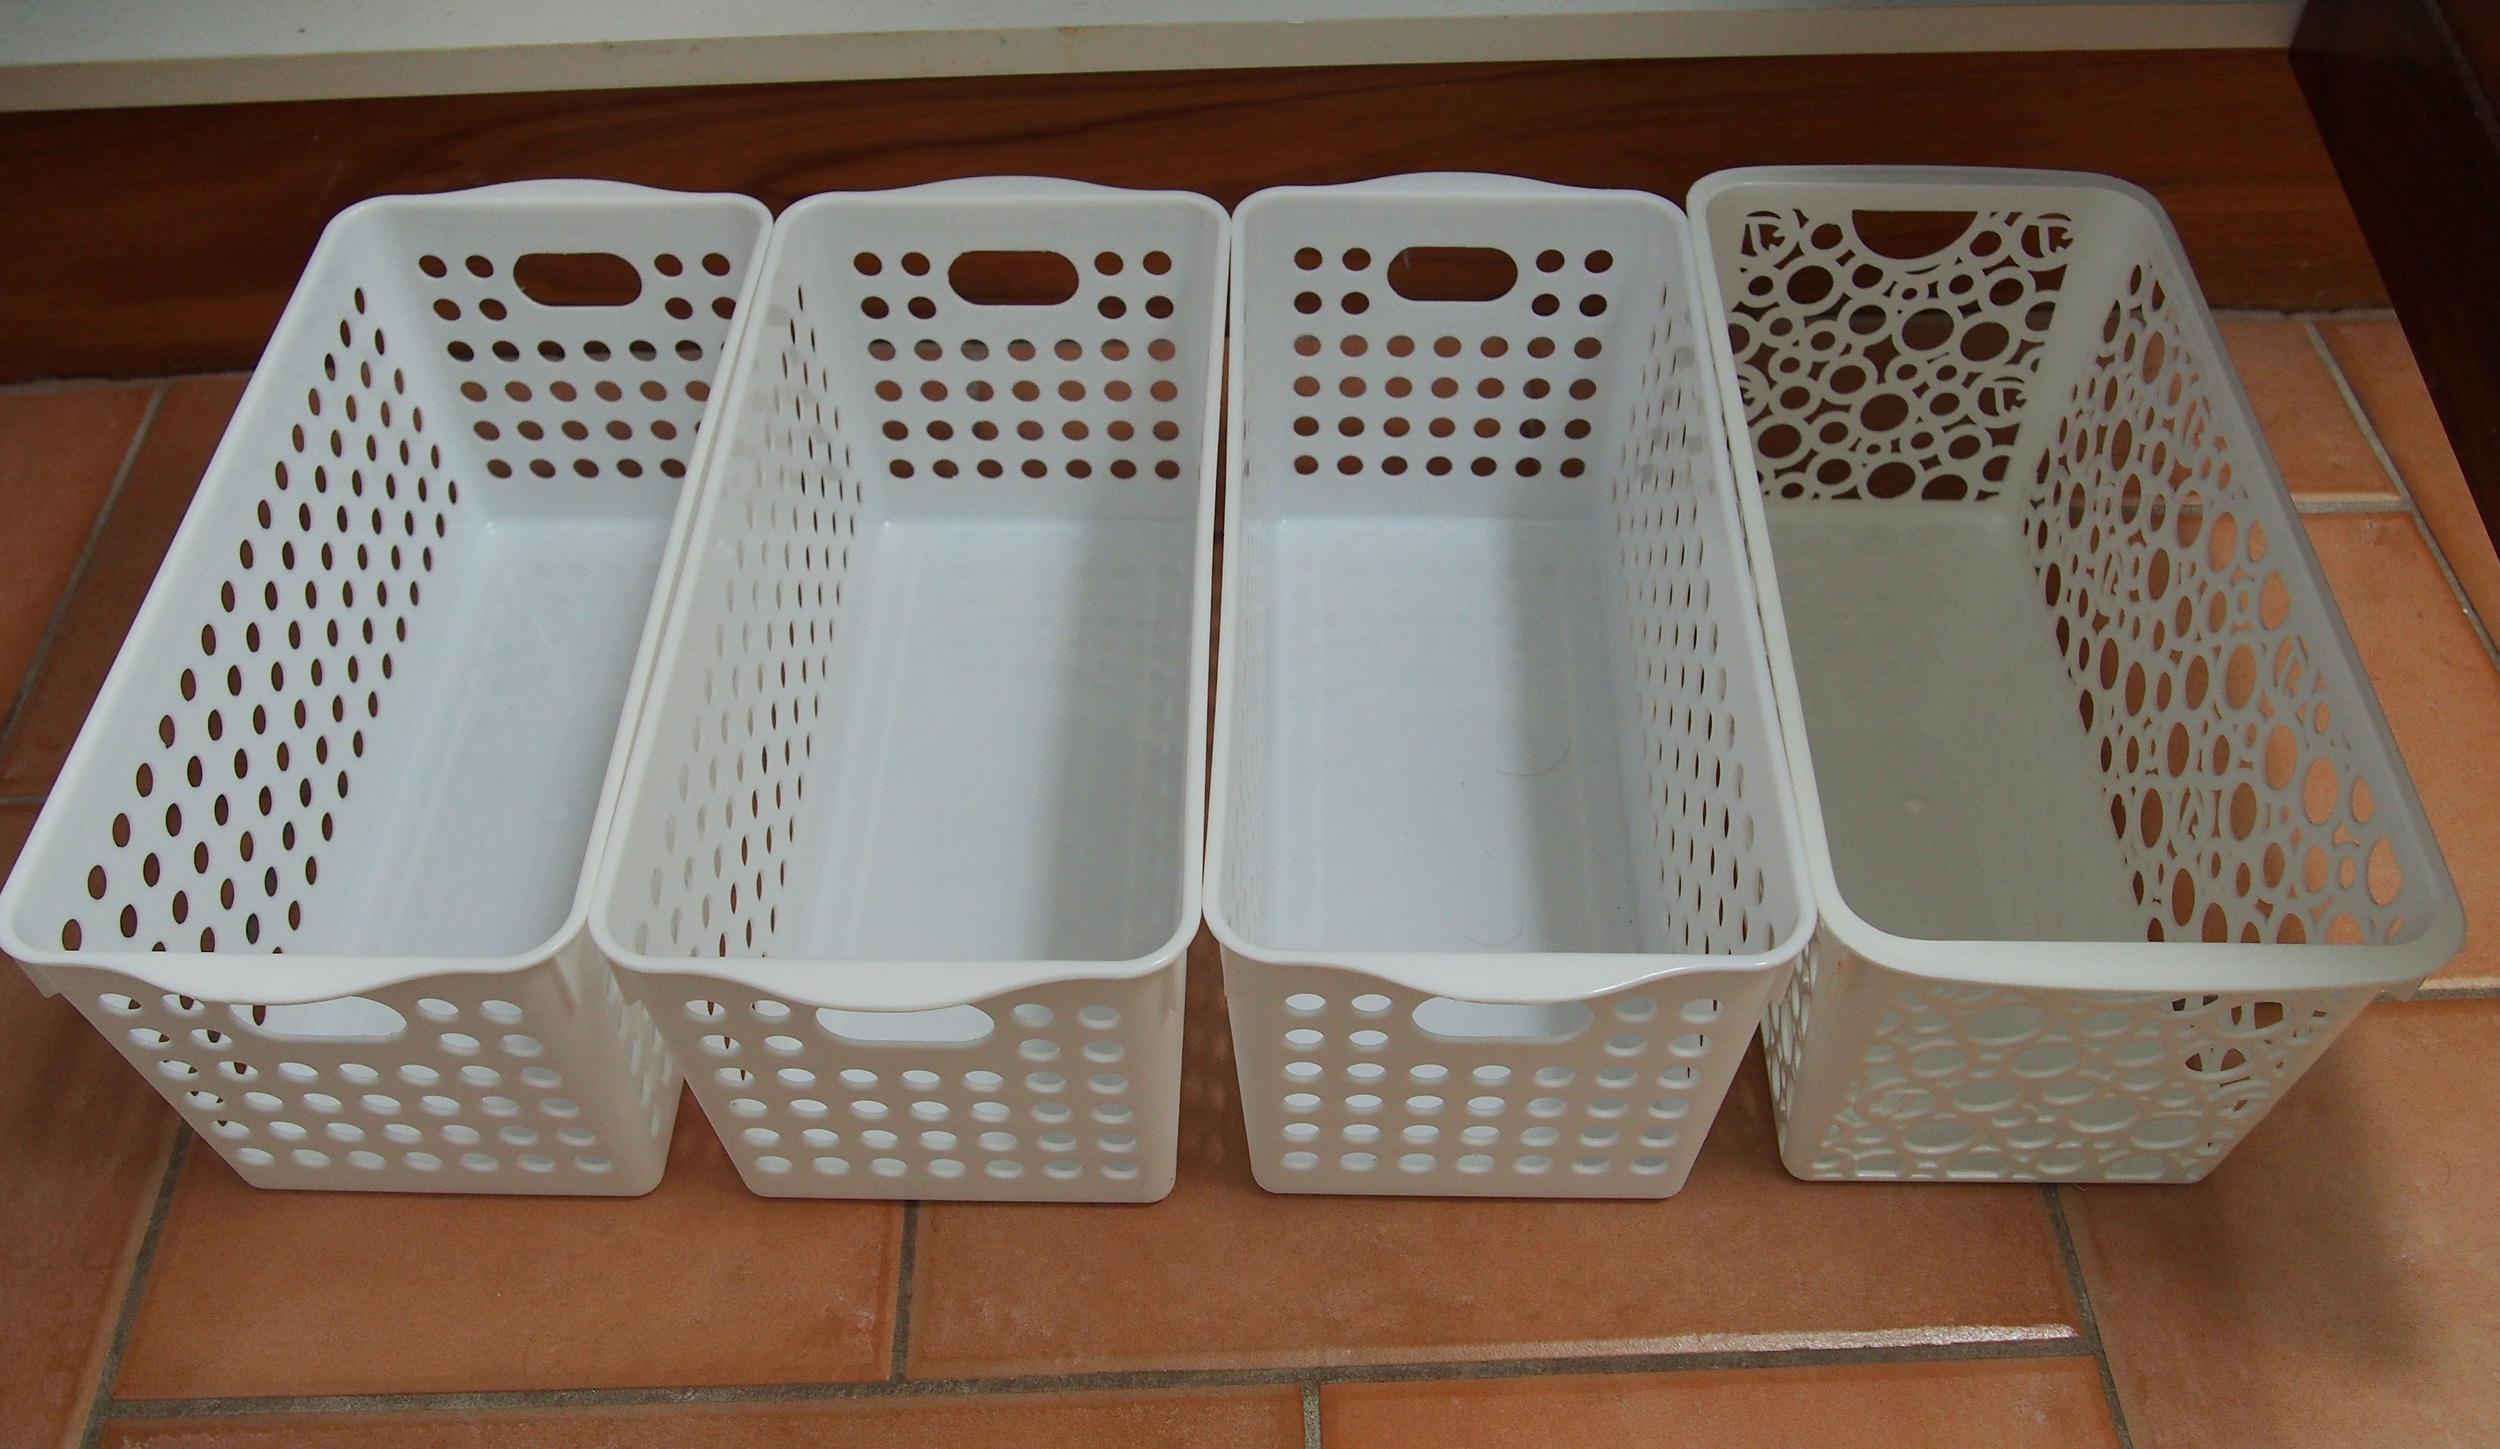 baskets storage solution for organising bathroom vanity